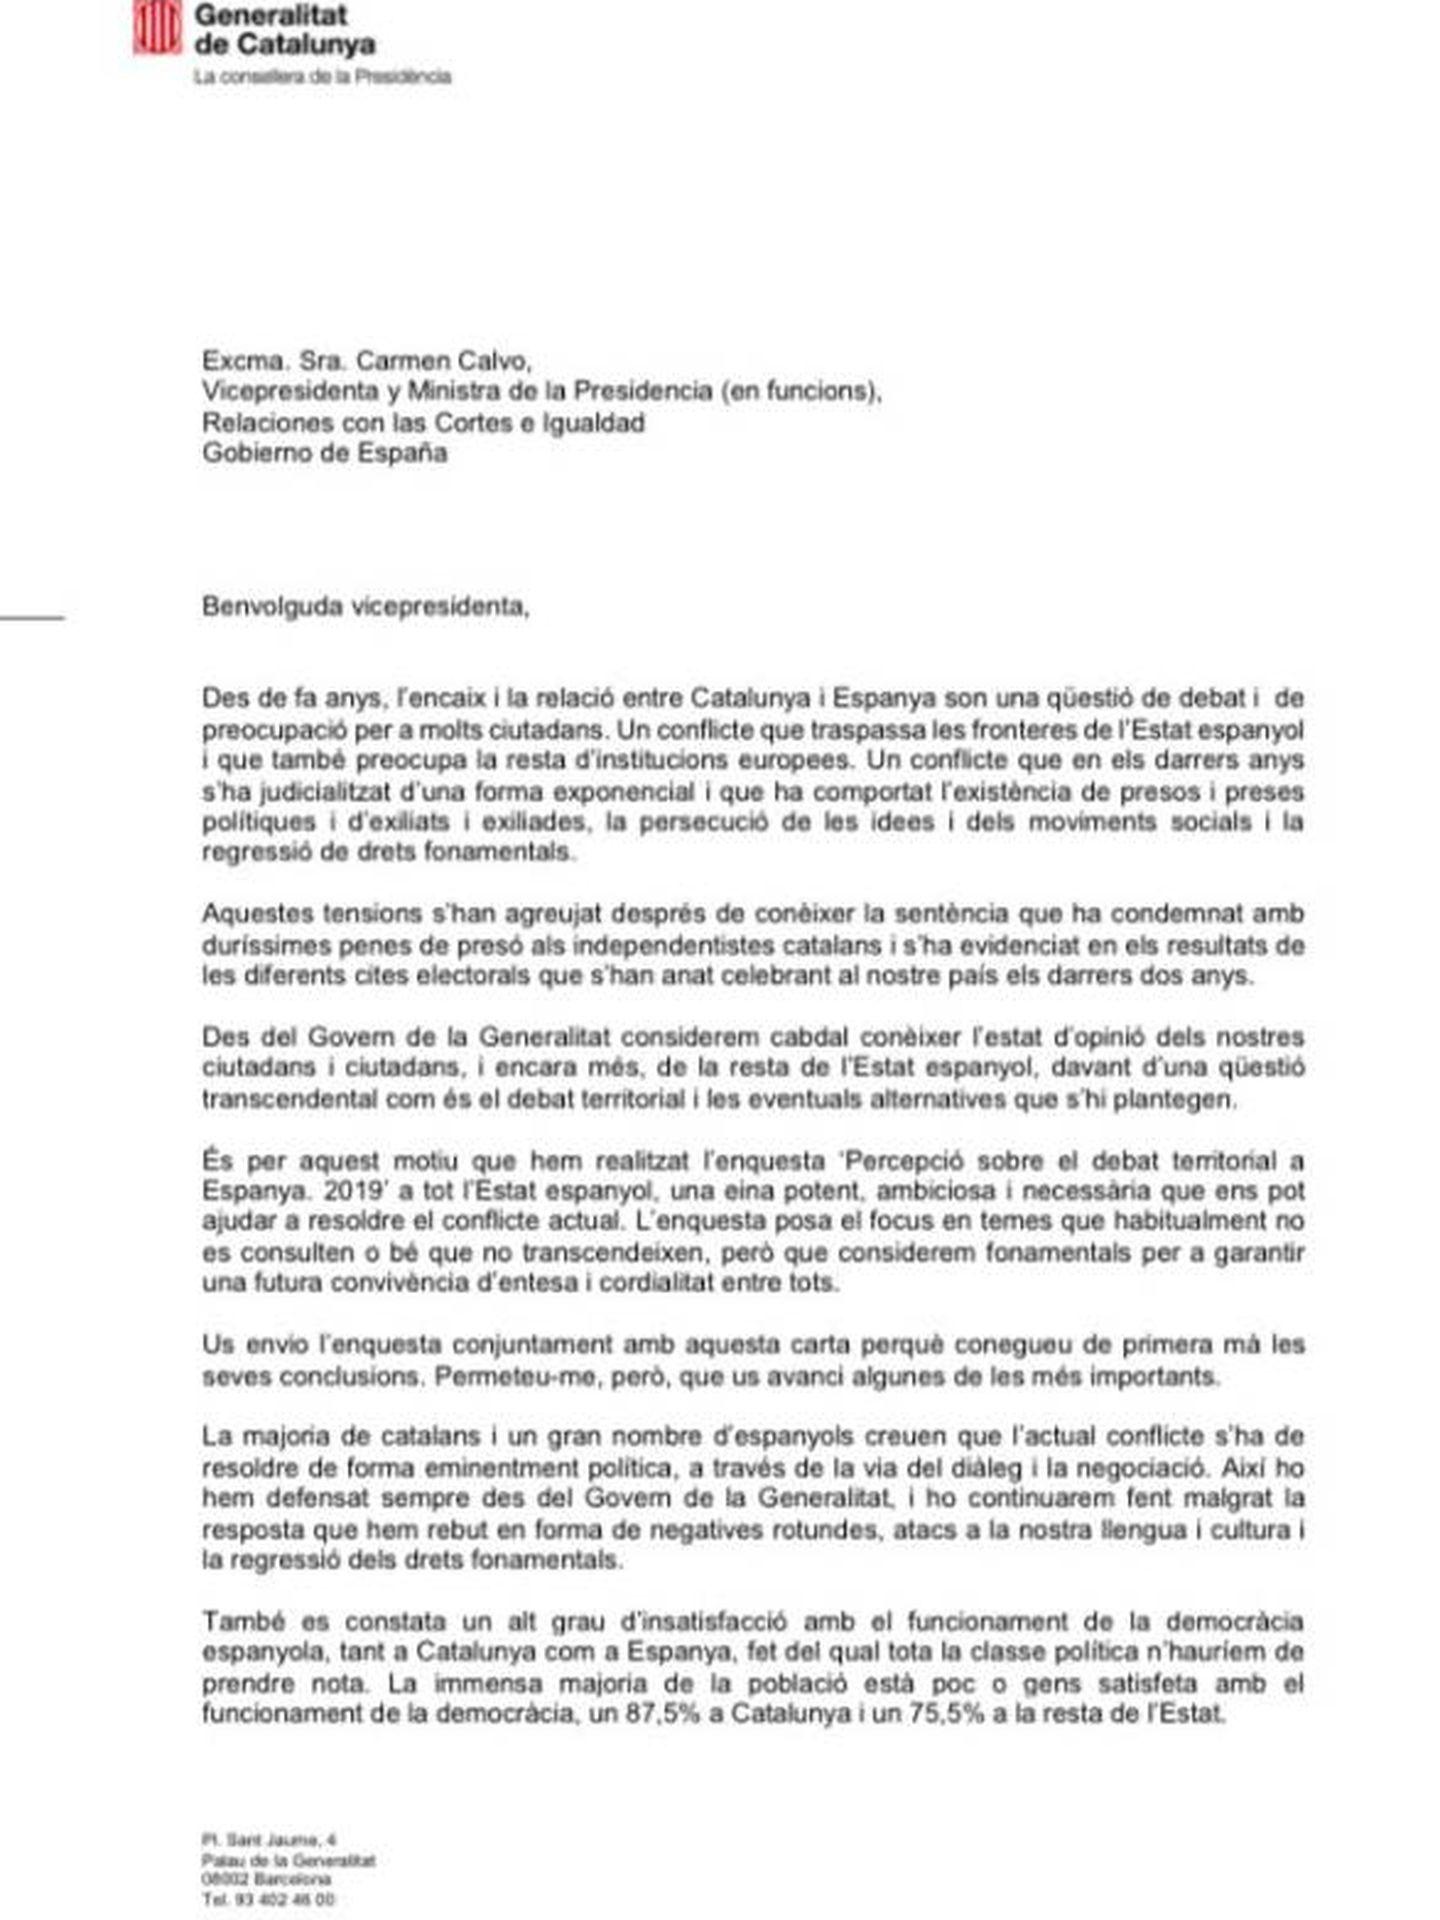 Pinche para leer la carta a Carmen Calvo.